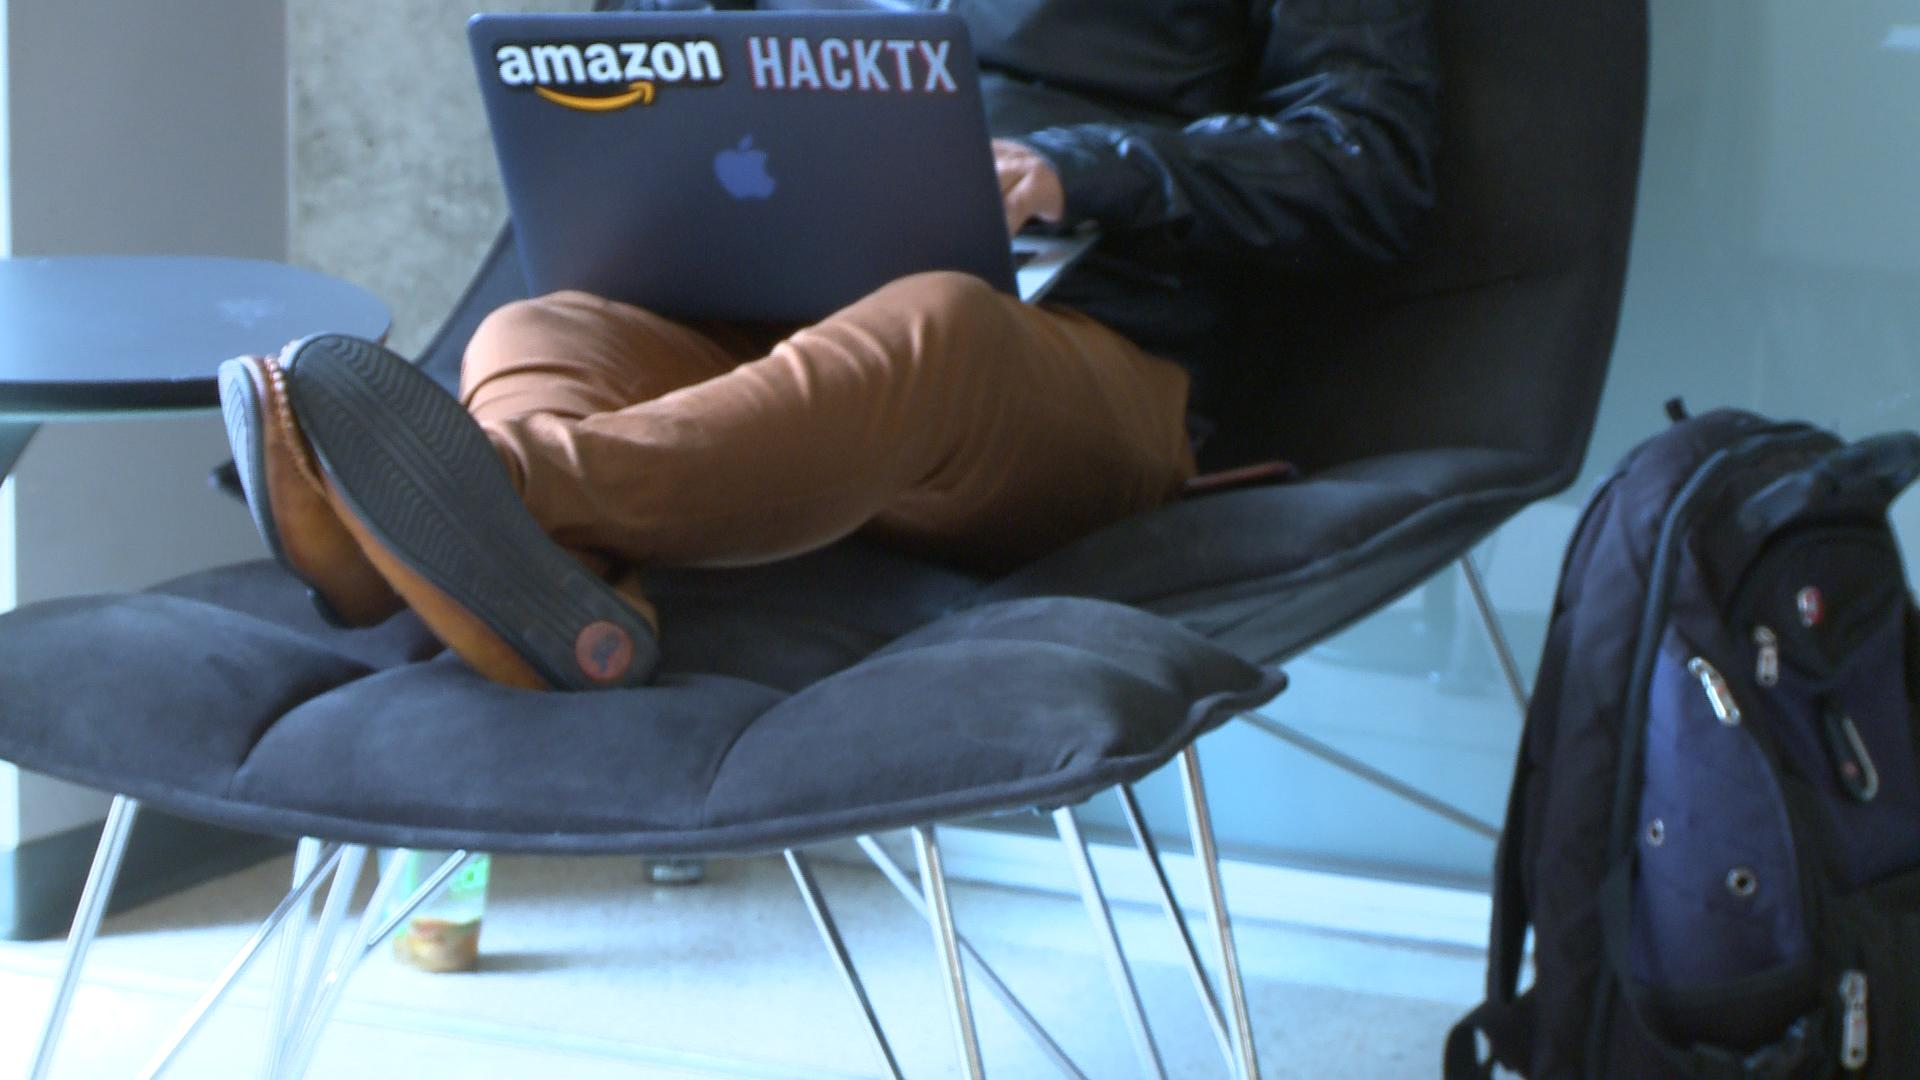 P-Amazon Austin Tech Preparedness_618356